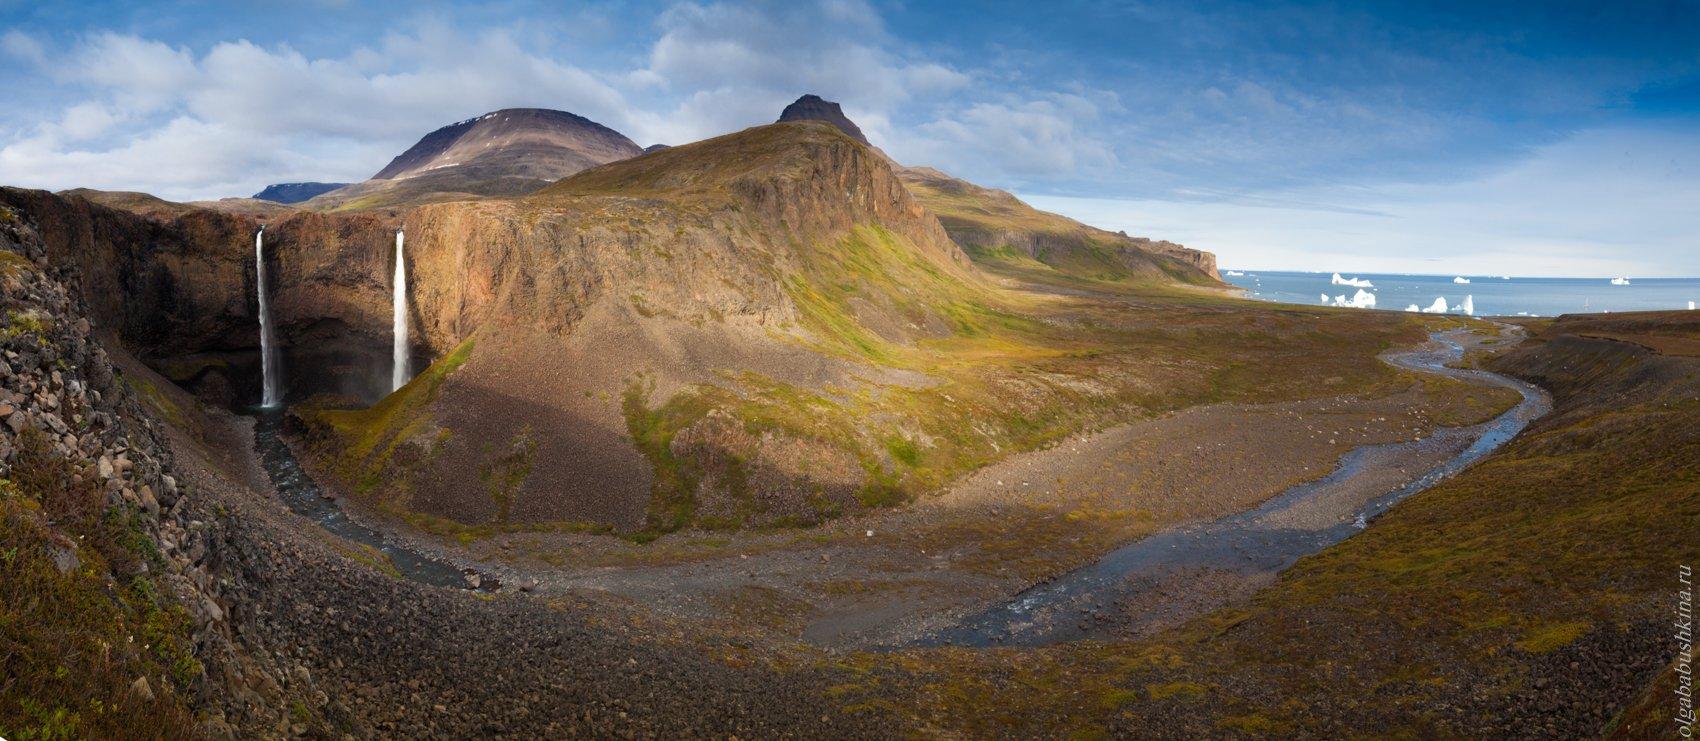 Гренландия, Исландия, водопад, айсберги, горы, Ольга Бабушкина